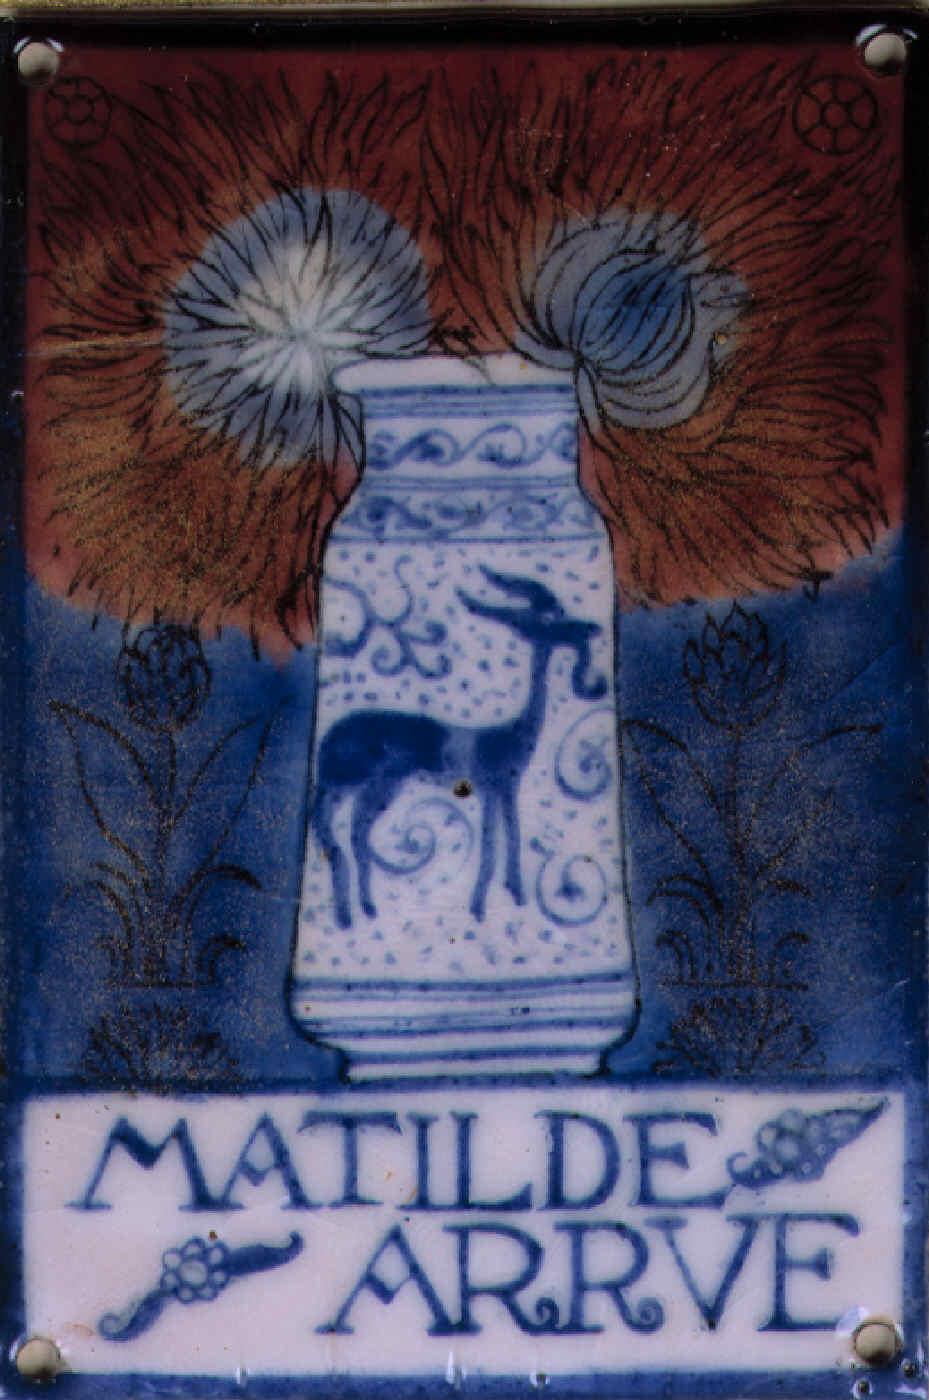 Matilde Arrúe